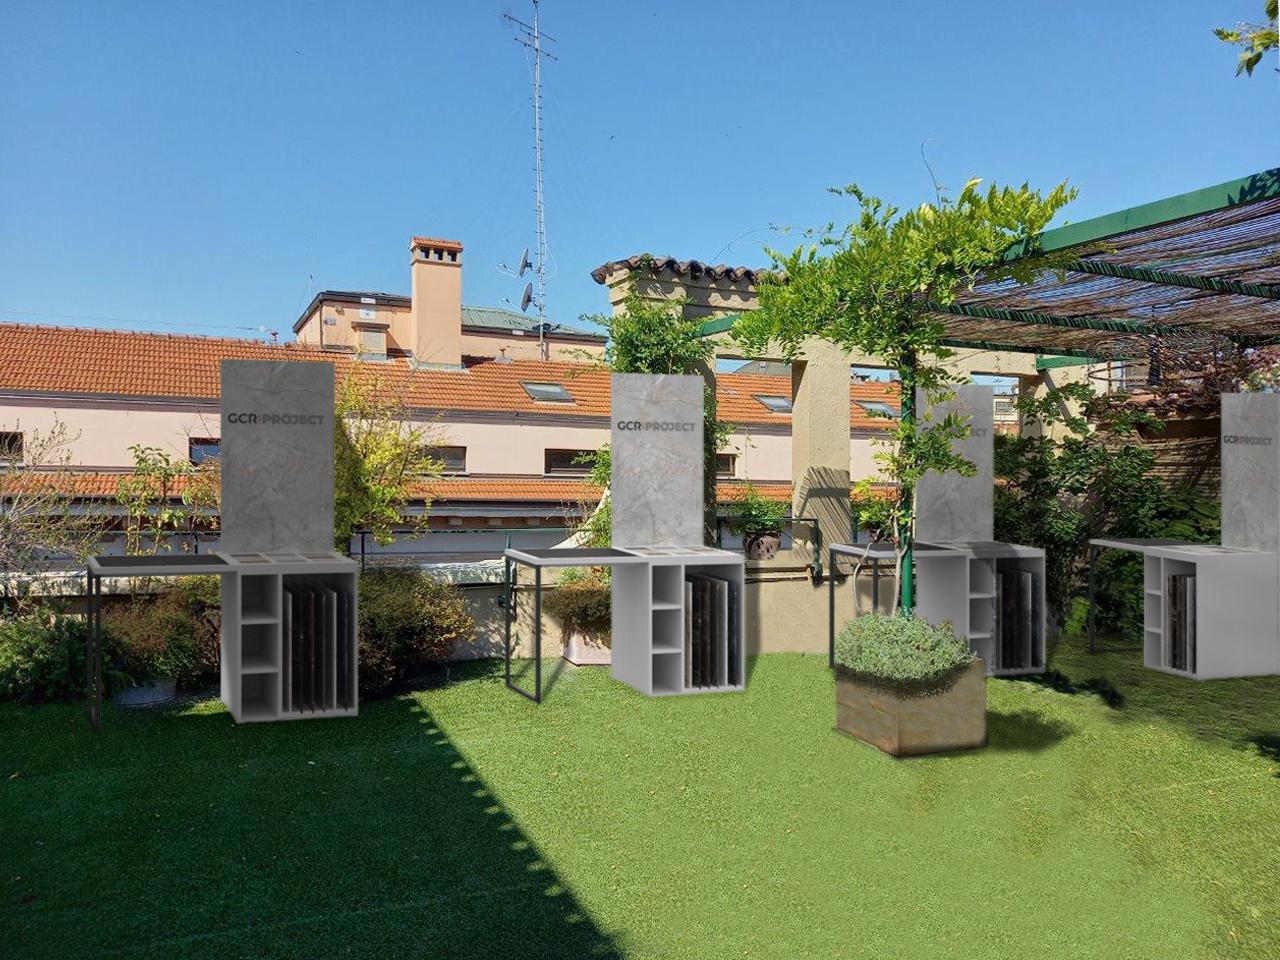 Terrazzo open air QuattroR 2